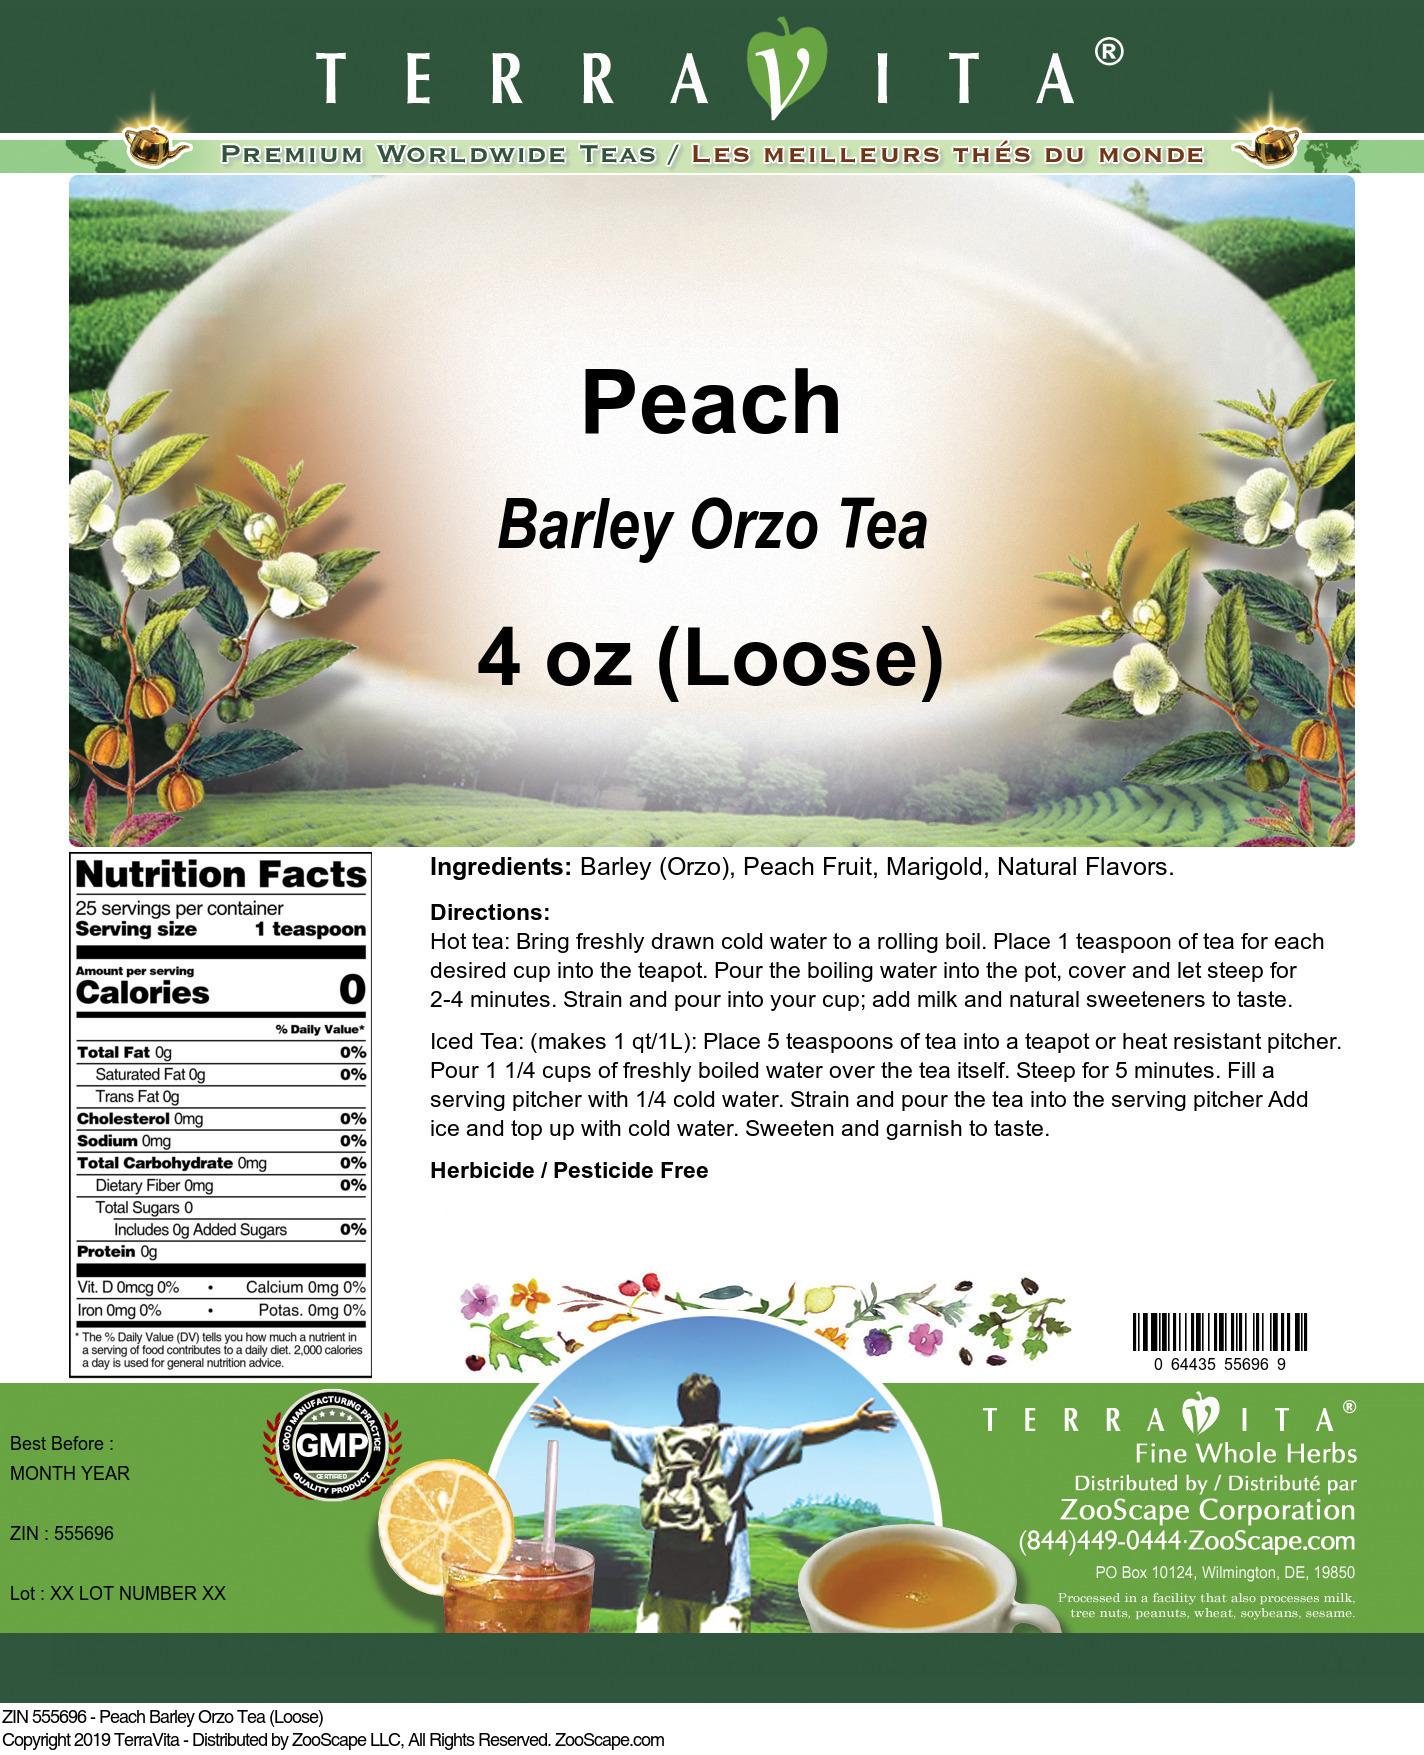 Peach Barley Orzo Tea (Loose)